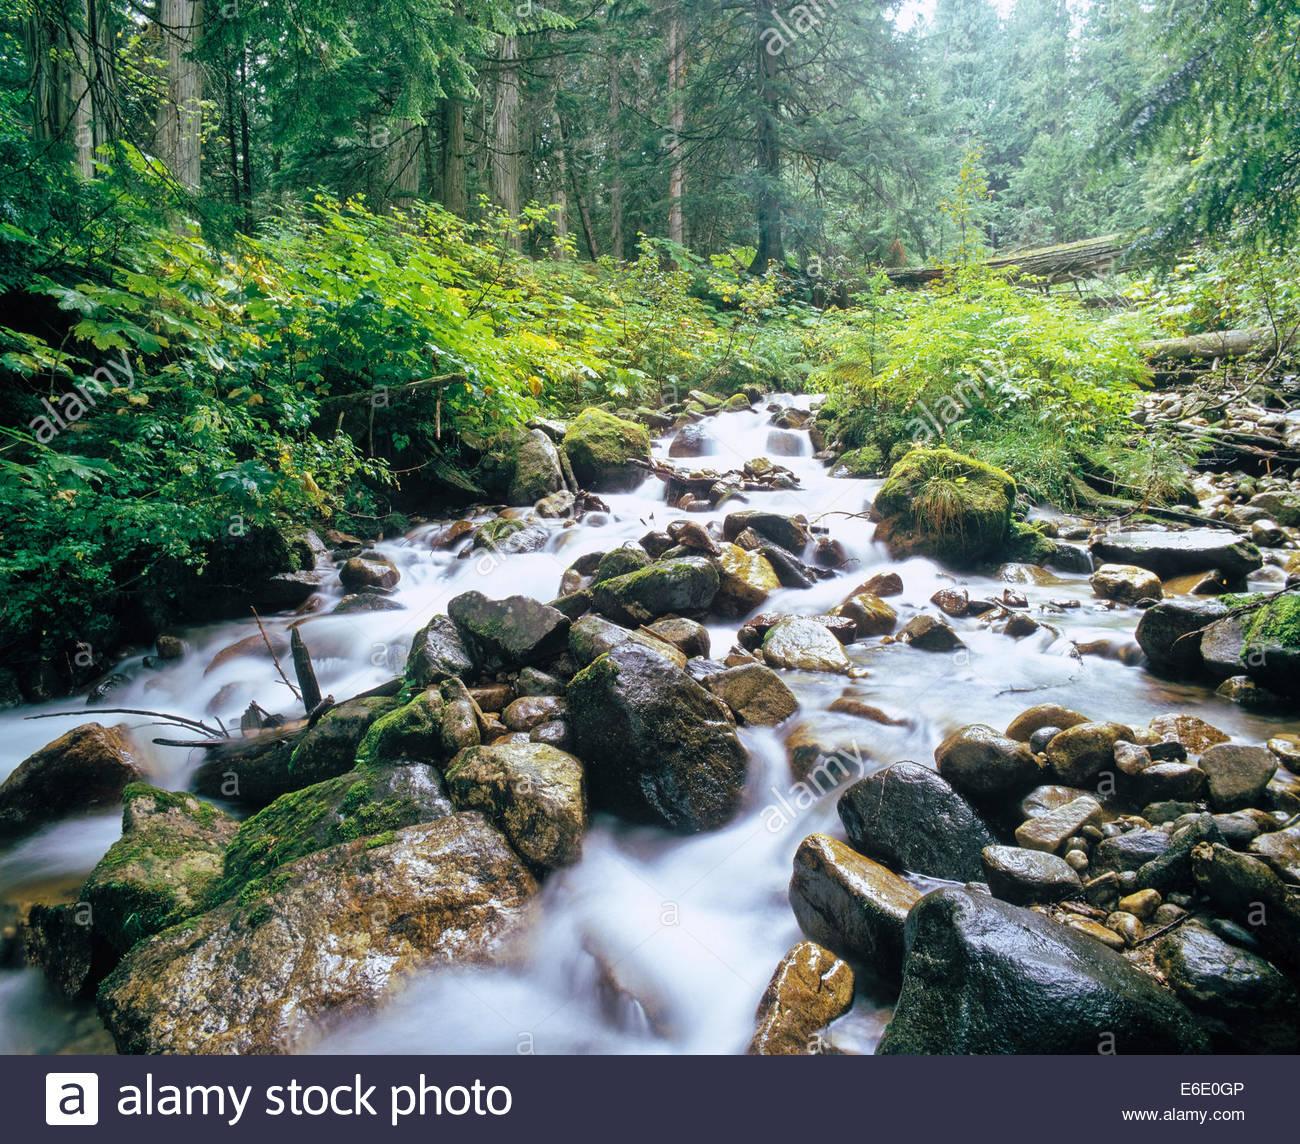 Stream through temperate rainforest in Mount Revelstoke National Park in British Columbia Canada - Stock Image